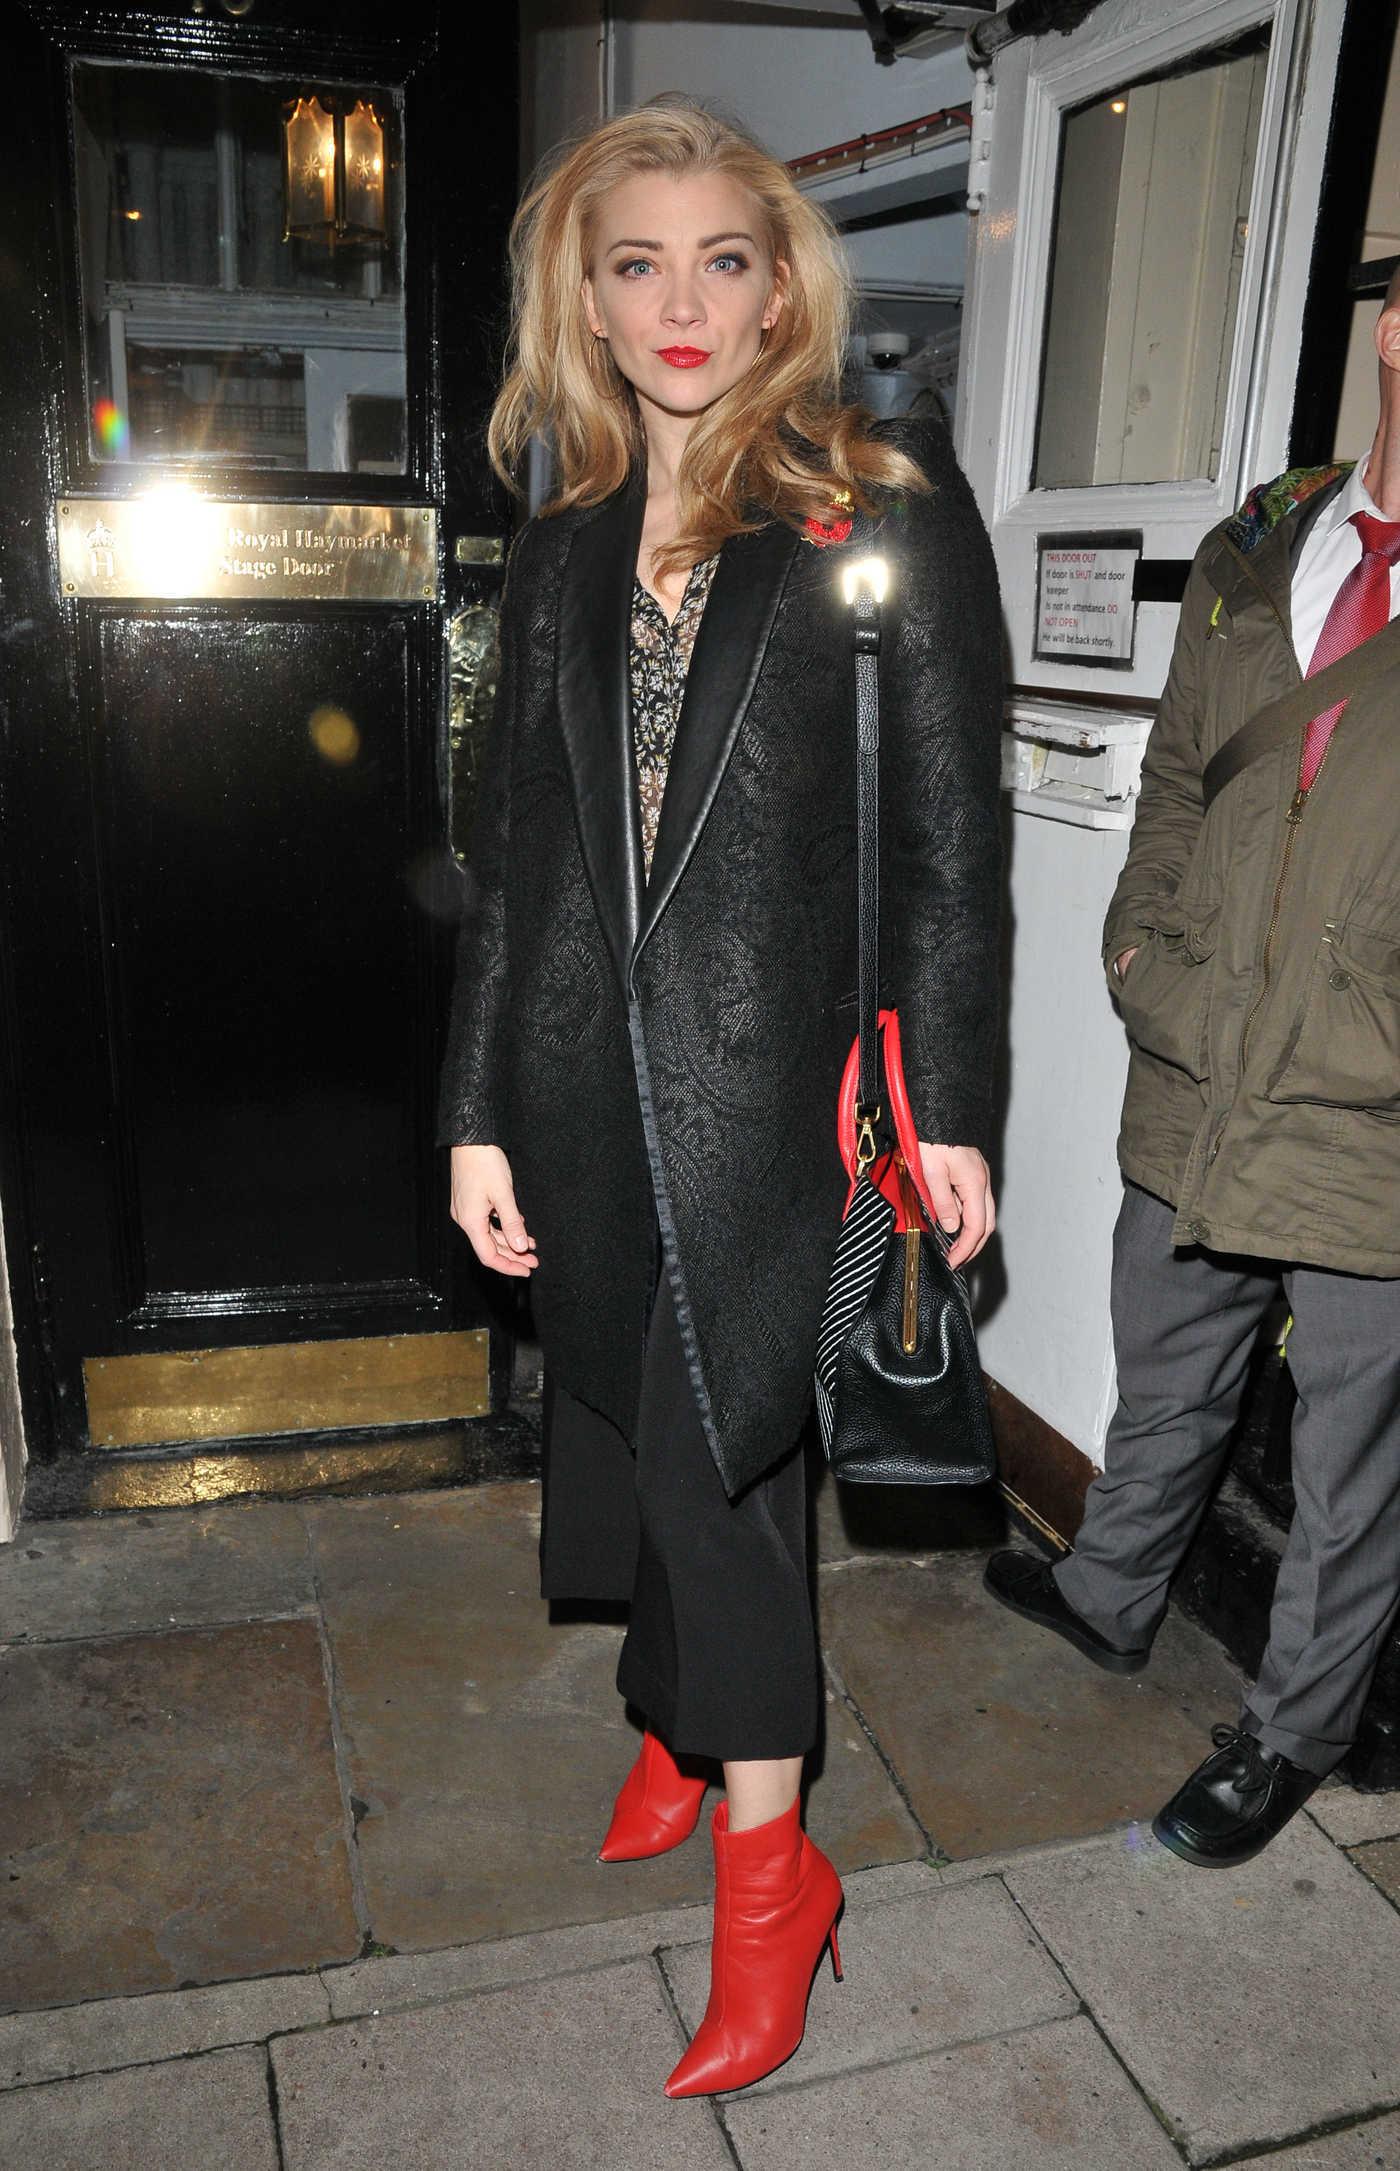 Natalie Dormer Leaves the Royal Haymarket Theatre in London 11/11/2017